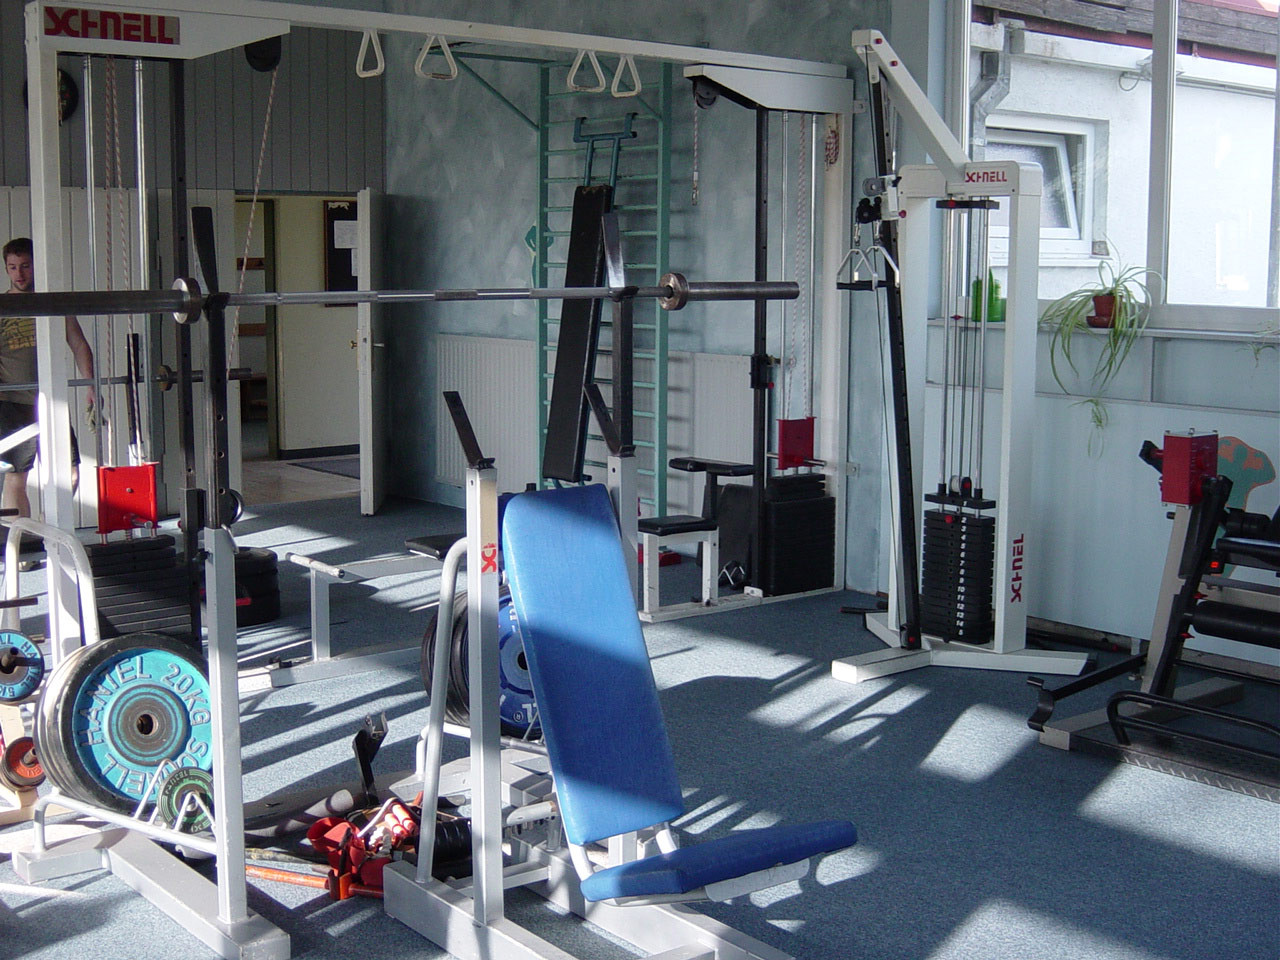 aco-fitnessraum-02